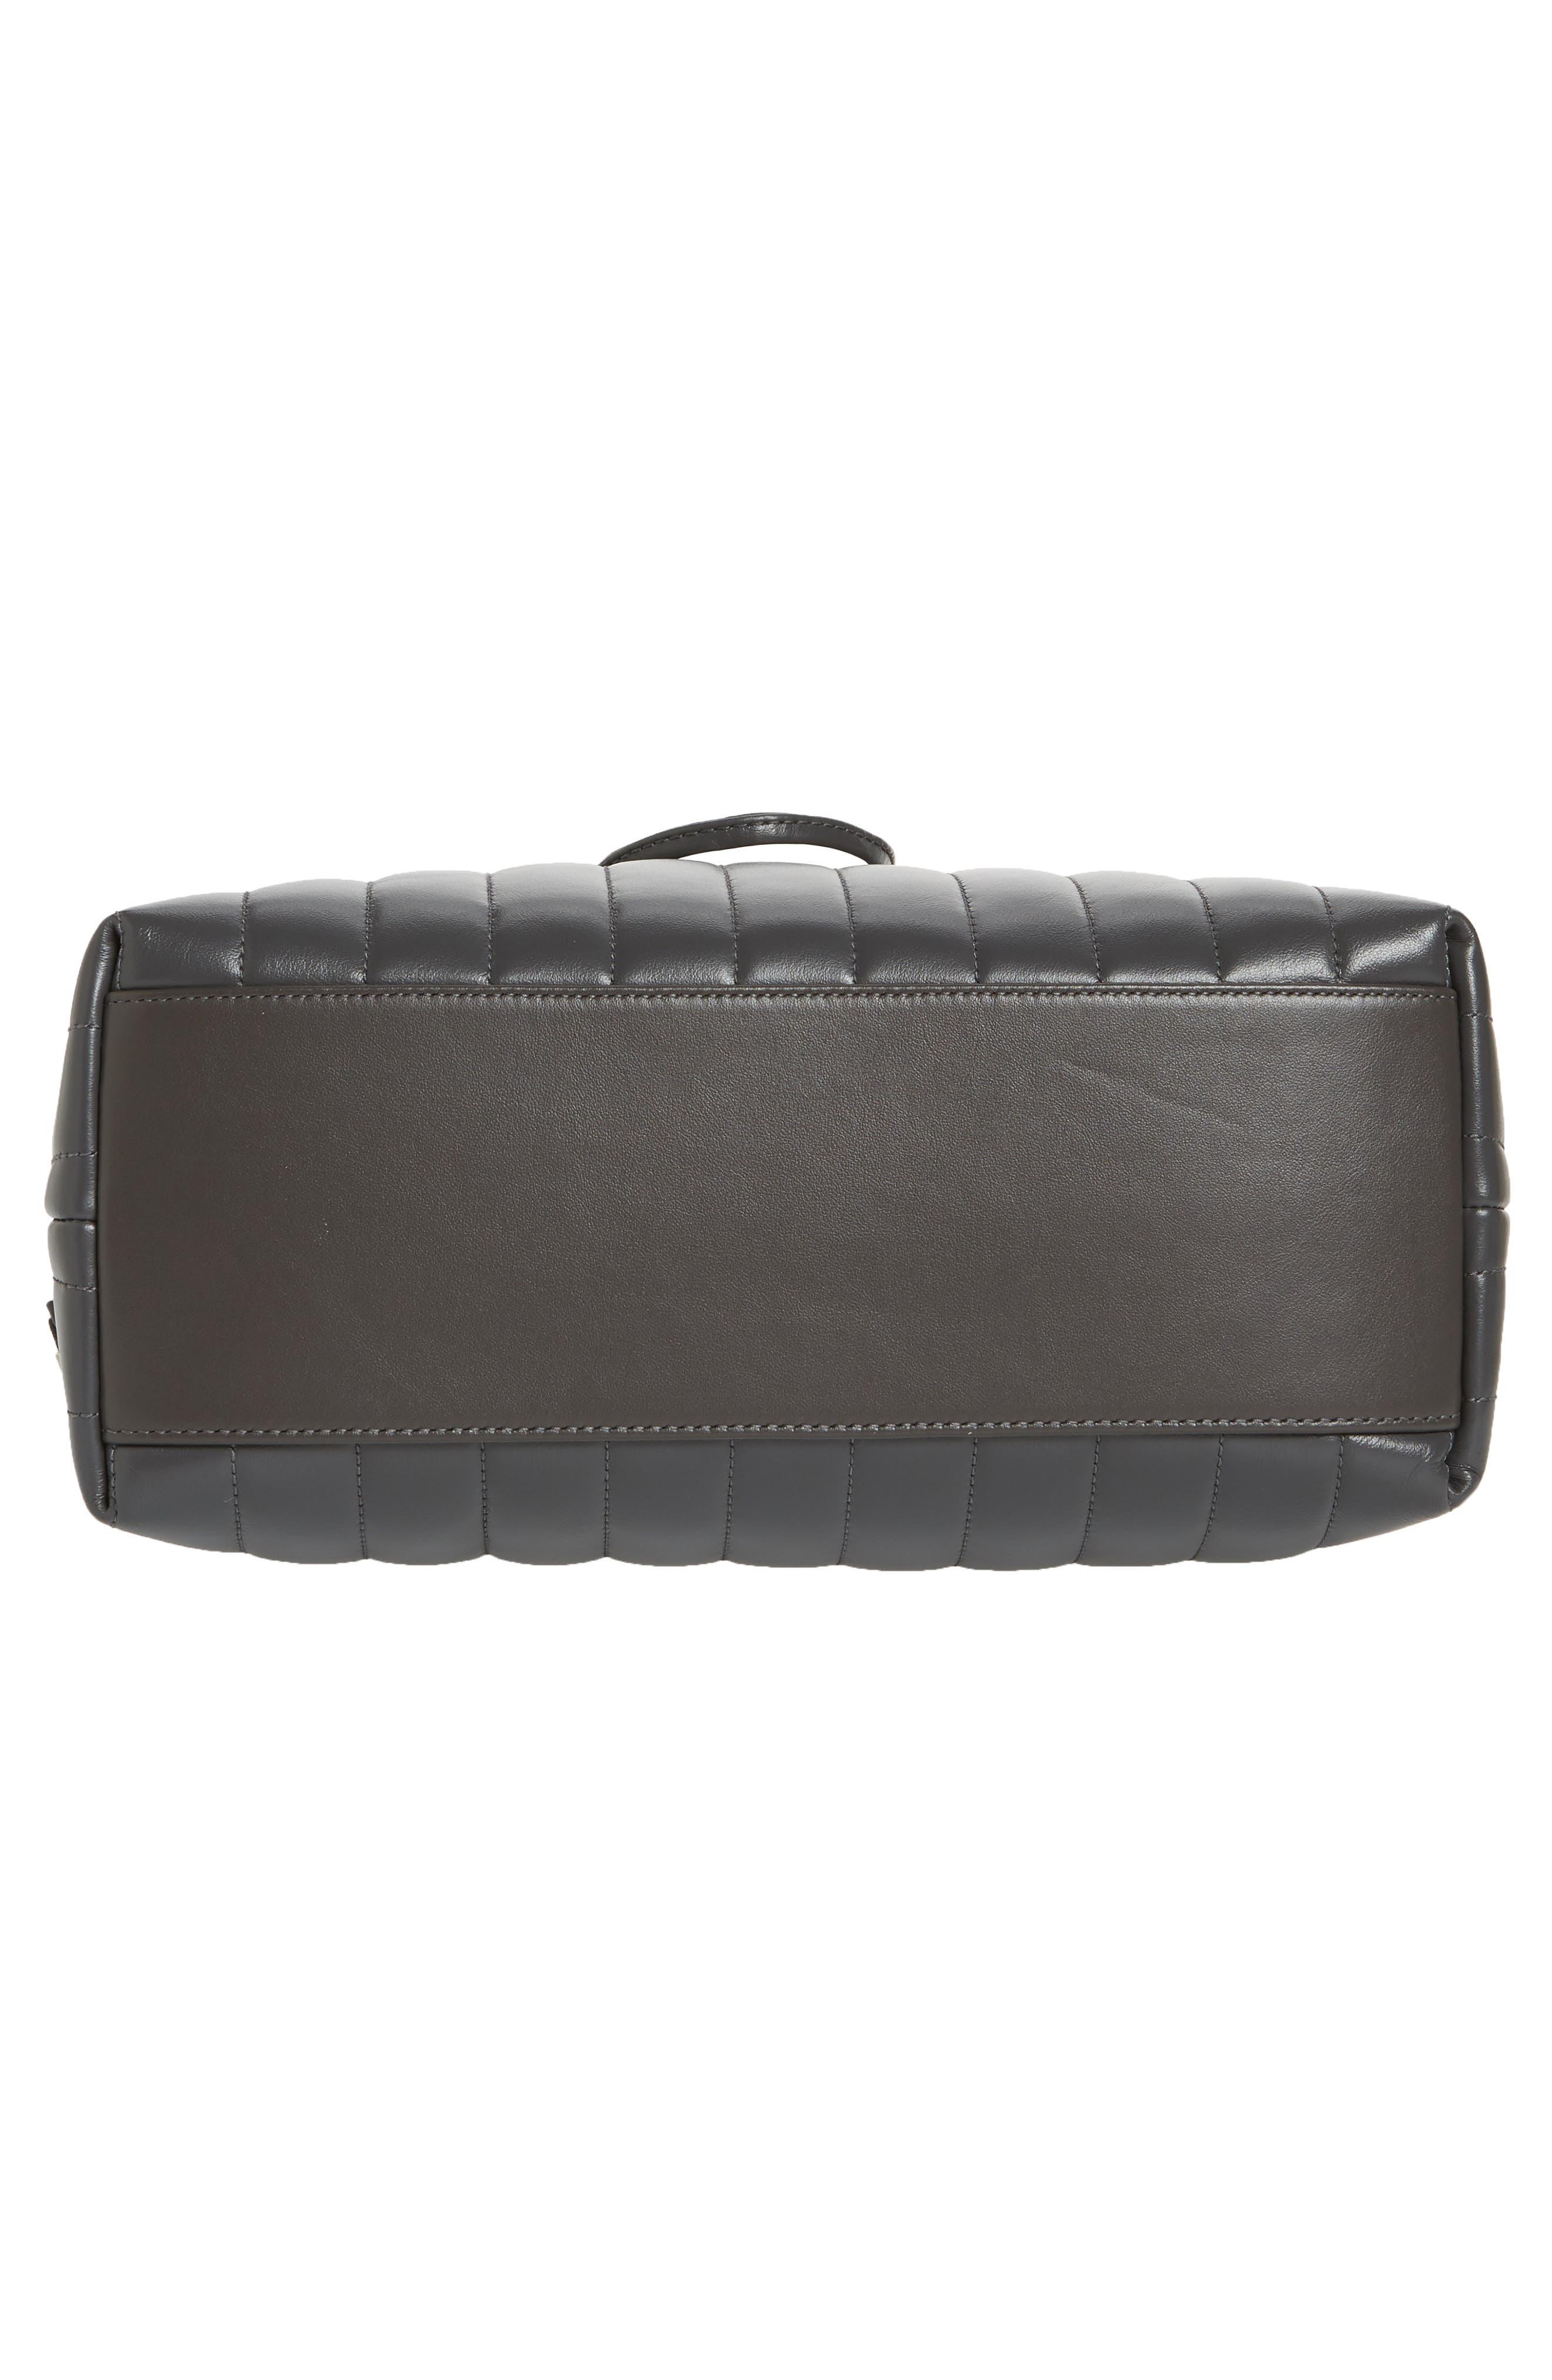 Medium Loulou Calfskin Leather Backpack,                             Alternate thumbnail 6, color,                             021